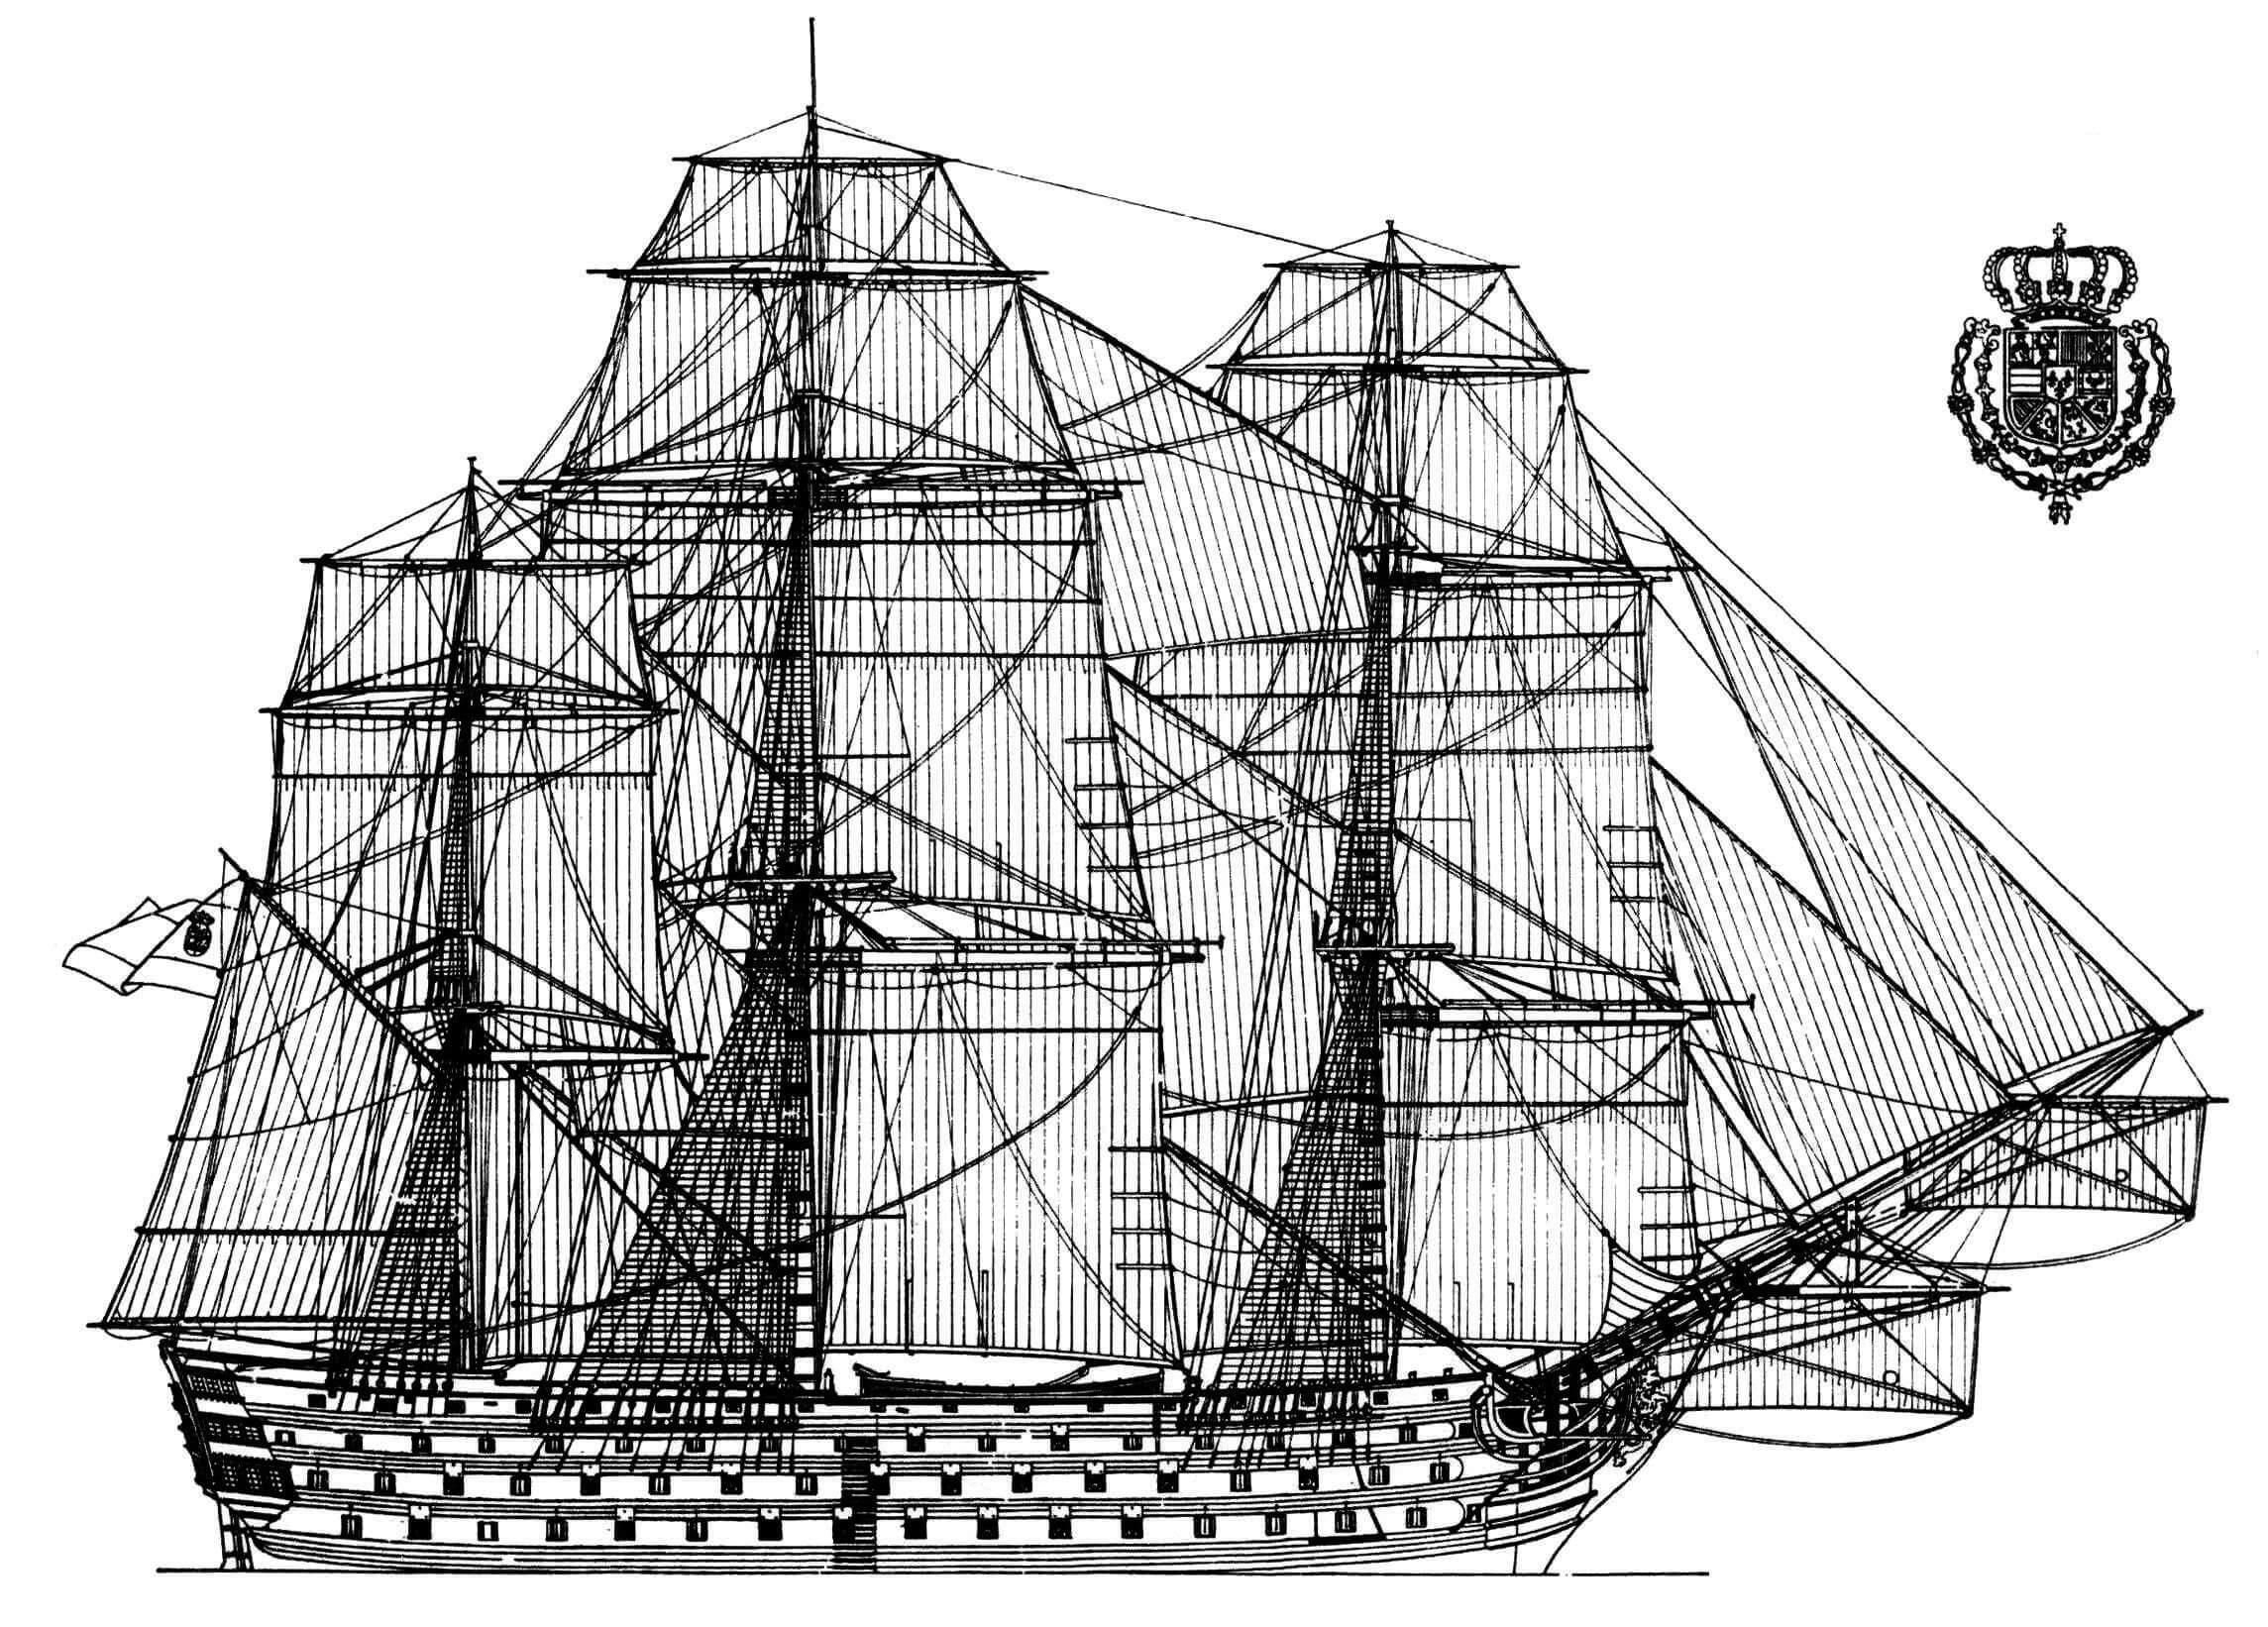 Реконструкция внешнего вида линейного корабля «Сантисима Тринидад»